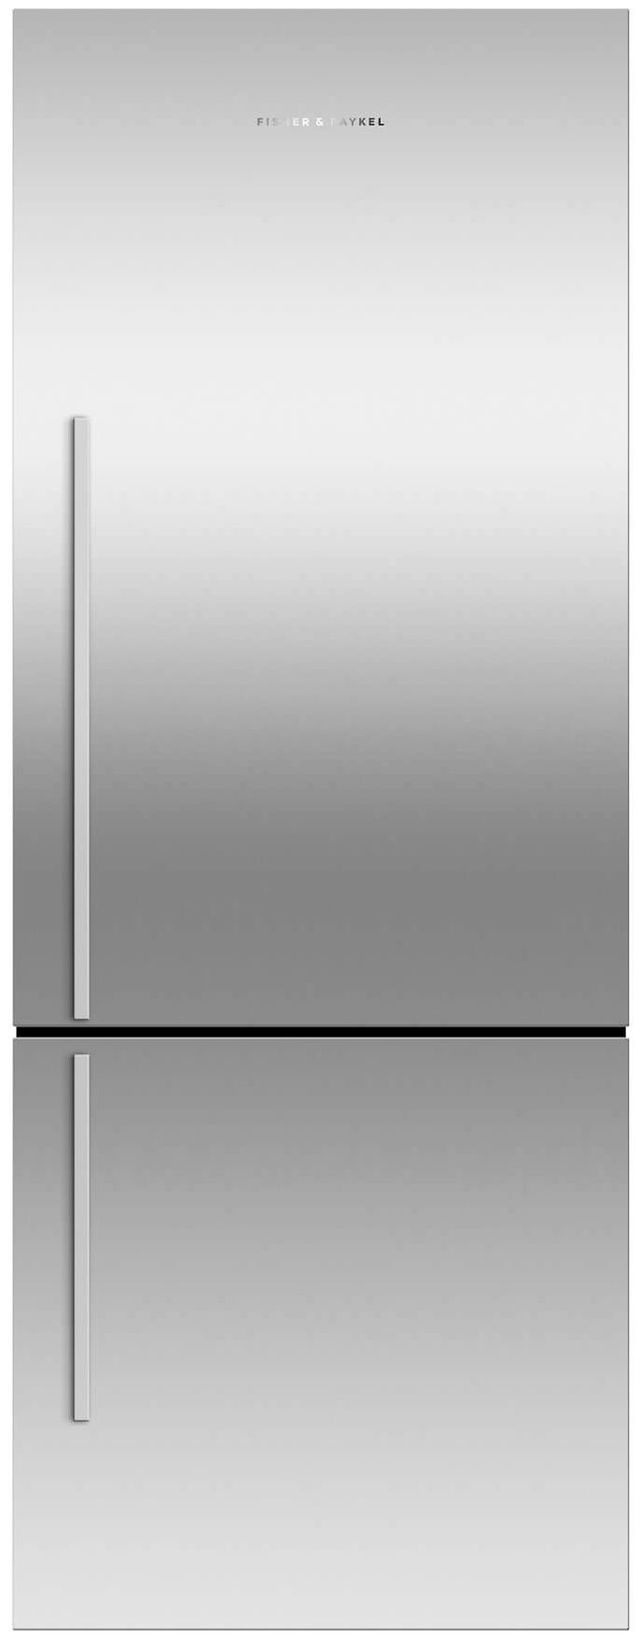 Fisher & Paykel 13.5 Cu. Ft. Counter Depth Bottom Freezer Refrigerator-EZKleen Stainless Steel-RF135BDRX4 N